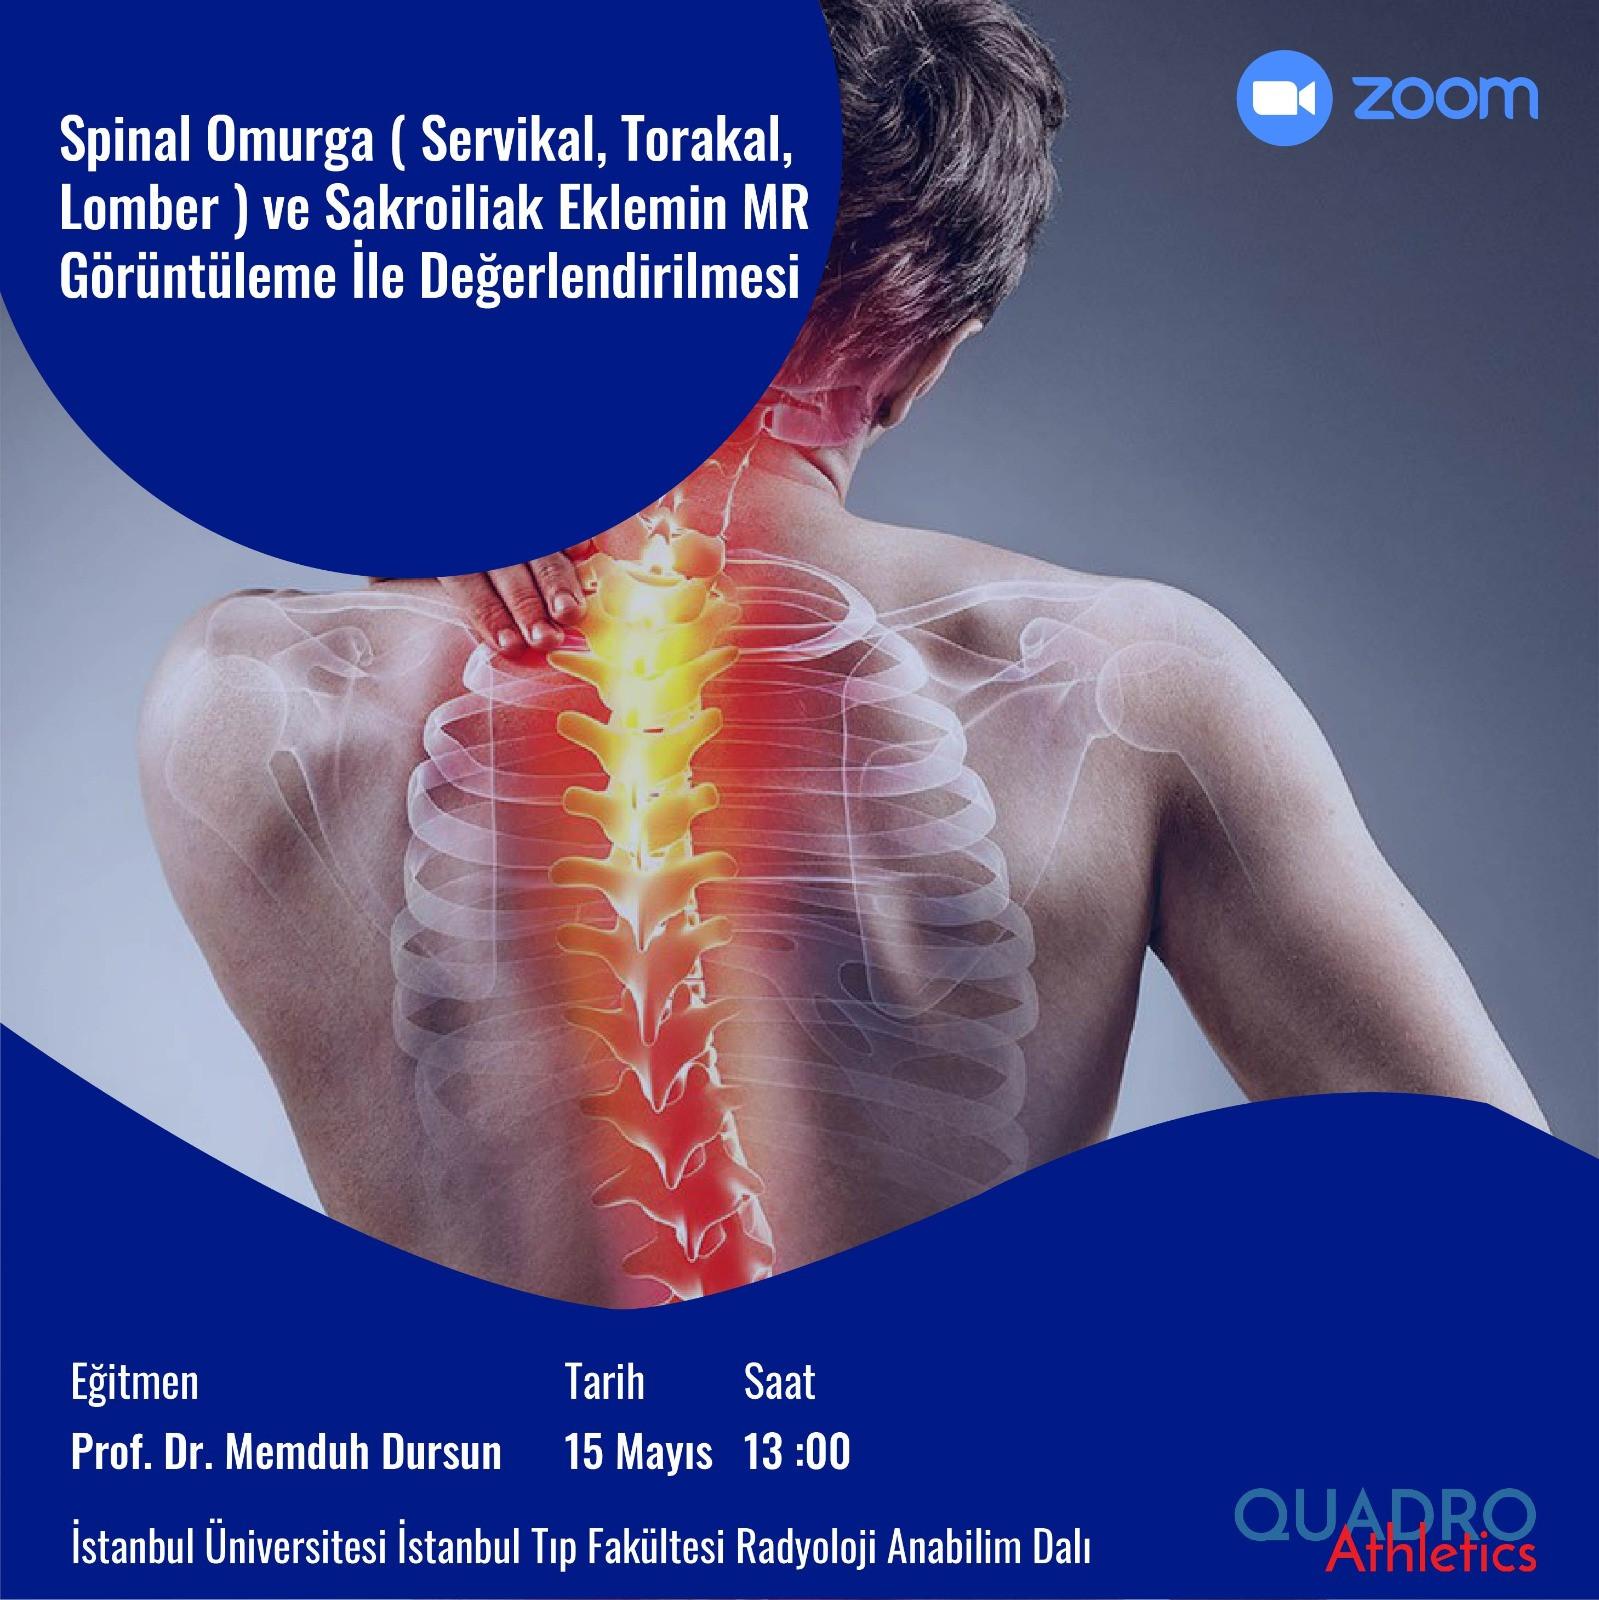 Spinal Omurga ( Servikal Torakal, Lomber